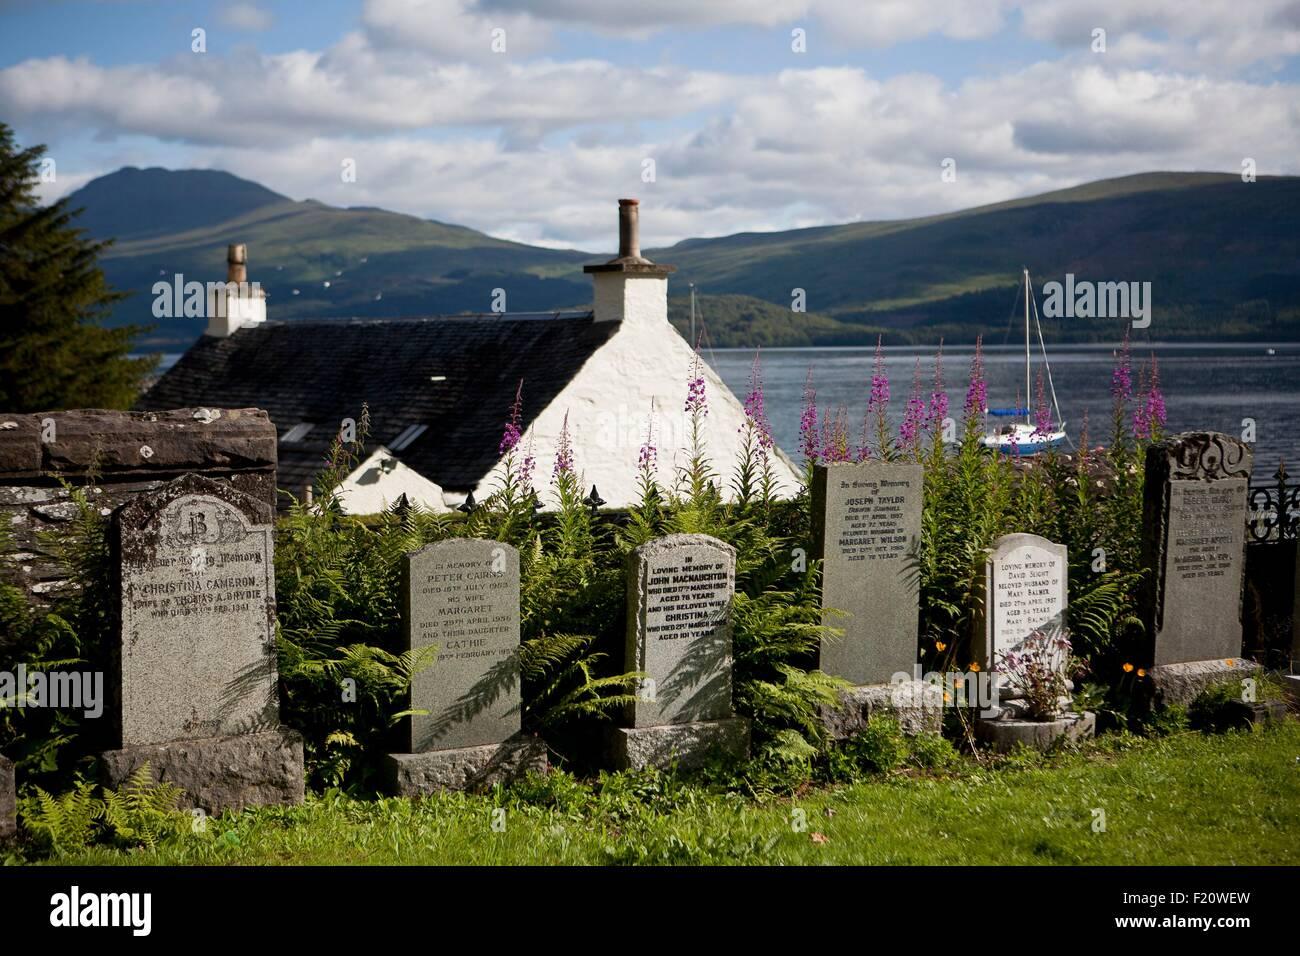 United Kingdom, Scotland, Highland, Luss, cemetery - Stock Image